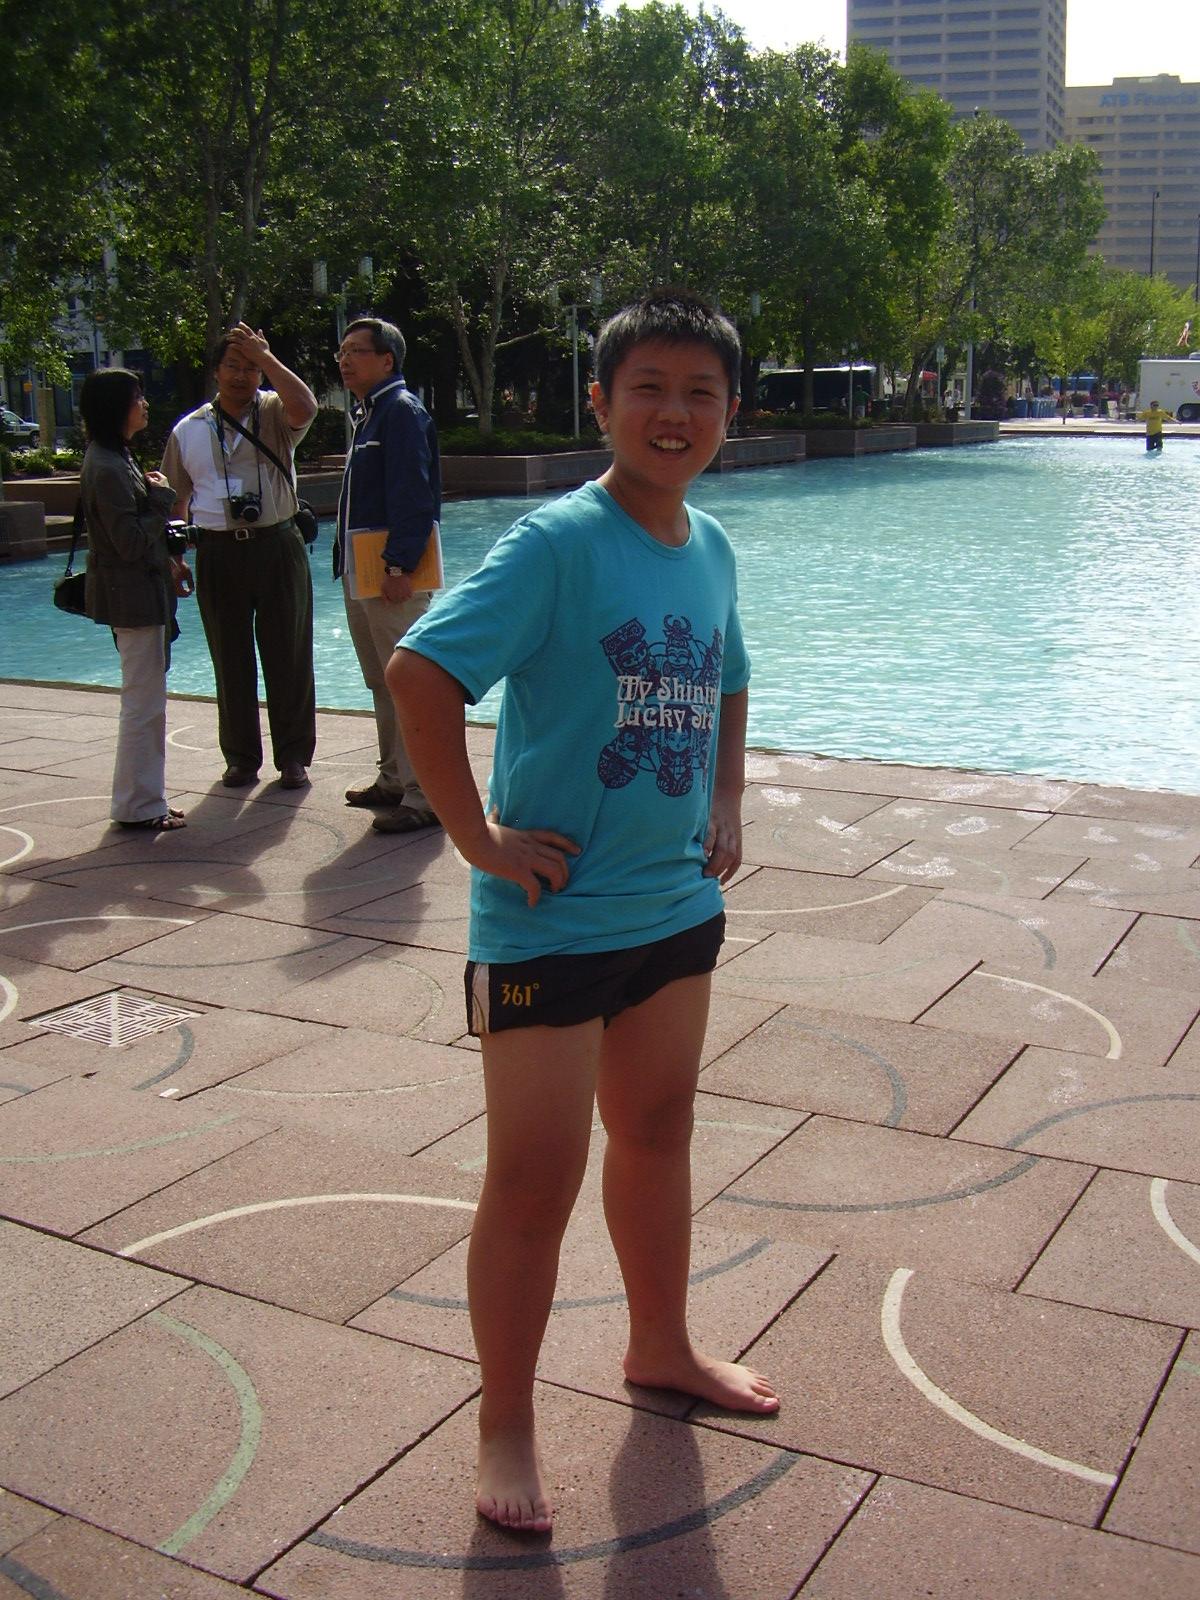 Boys in short shorts: September 2010